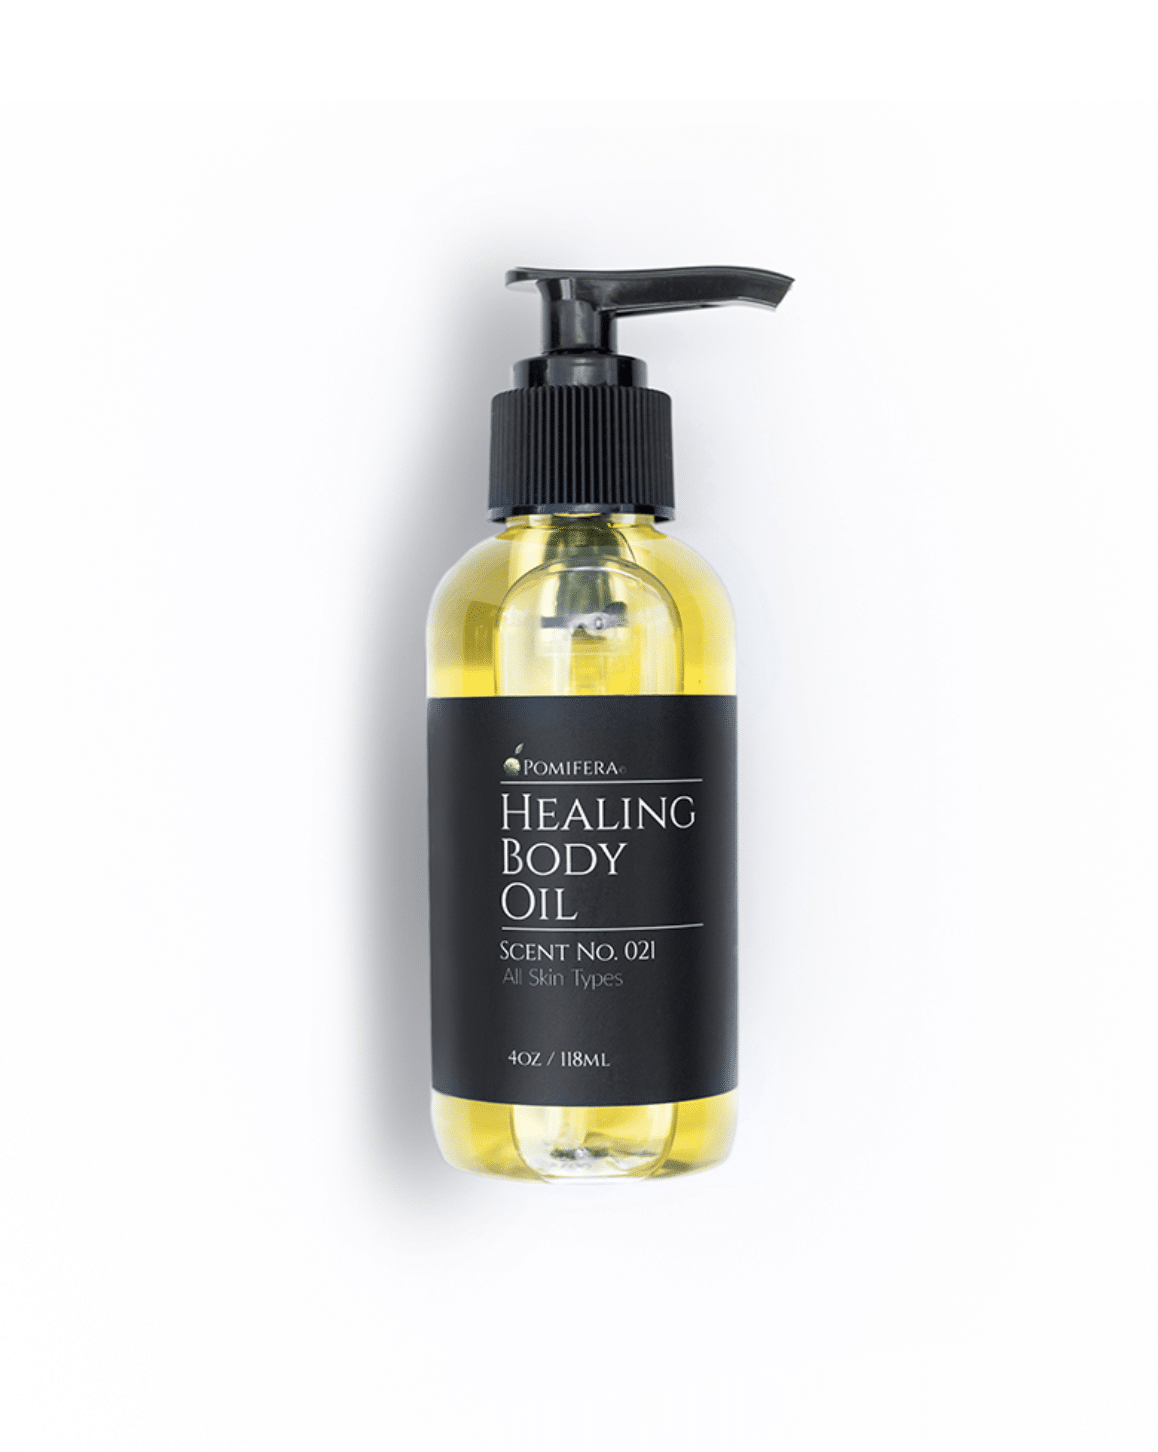 Pomifera Healing Body Oil